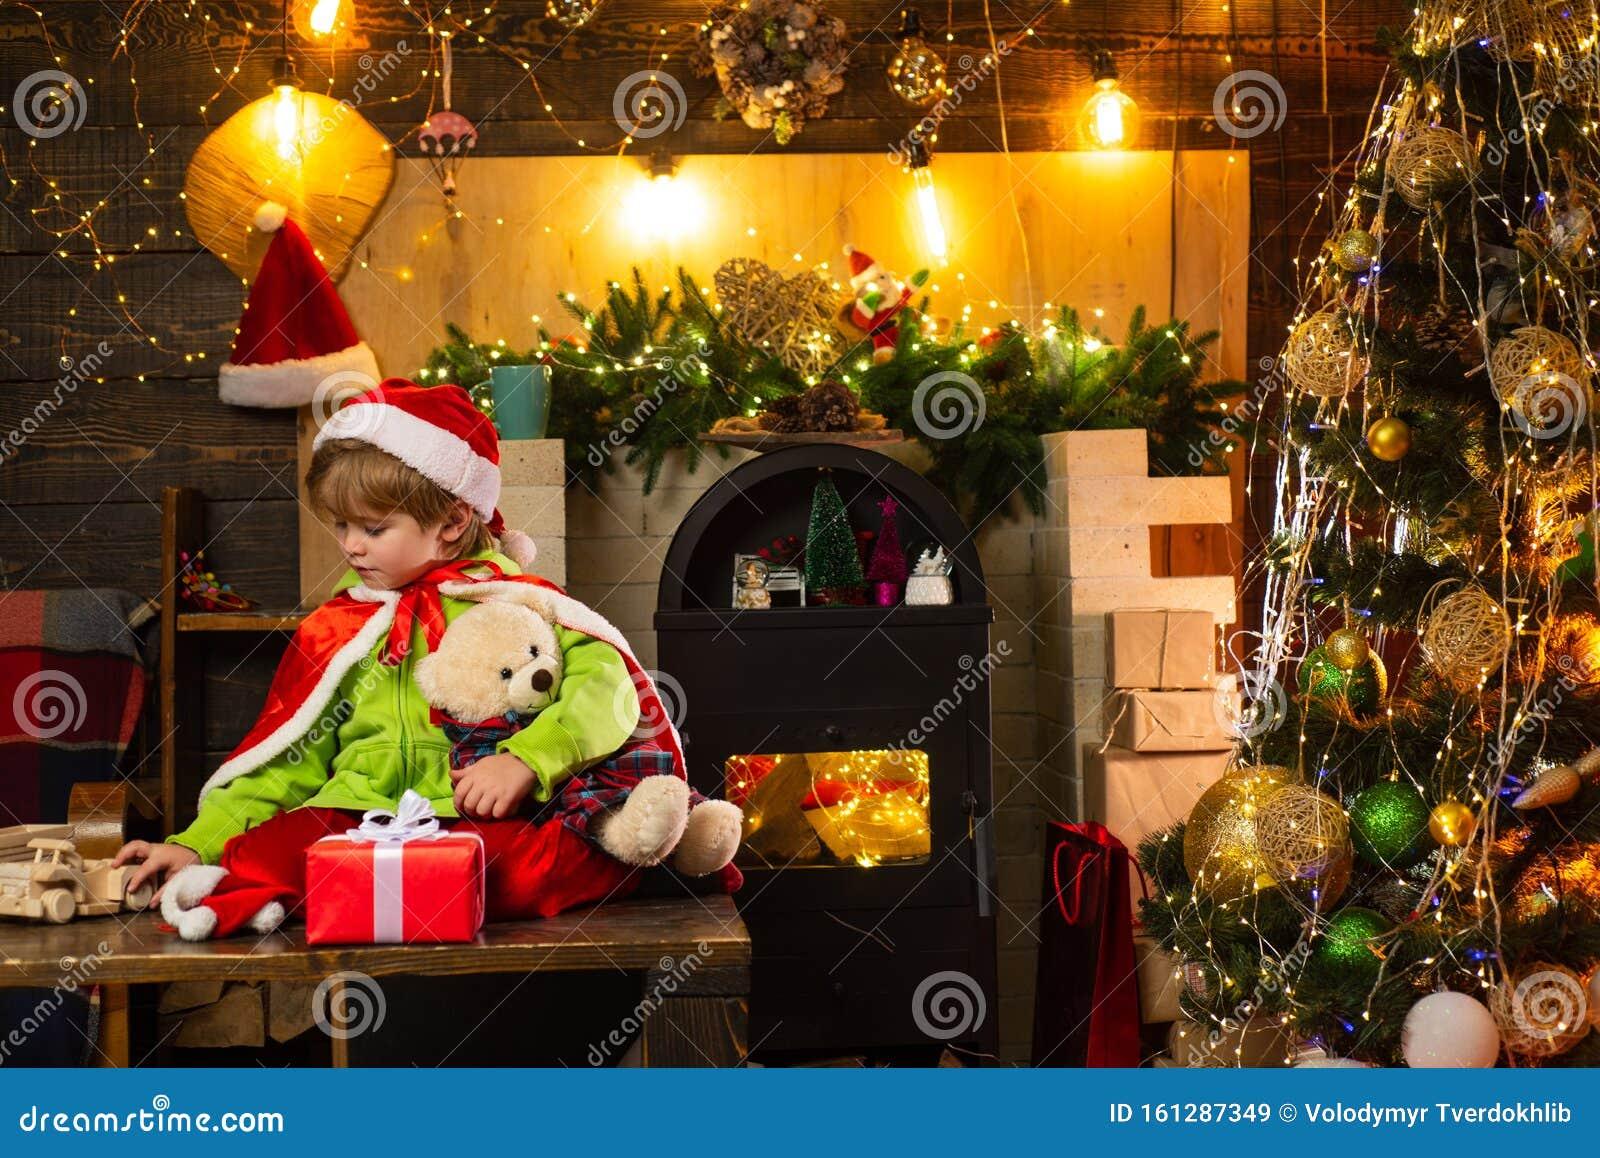 Christmas Natural Wood Christmas Tree Ornaments Santa Helpers